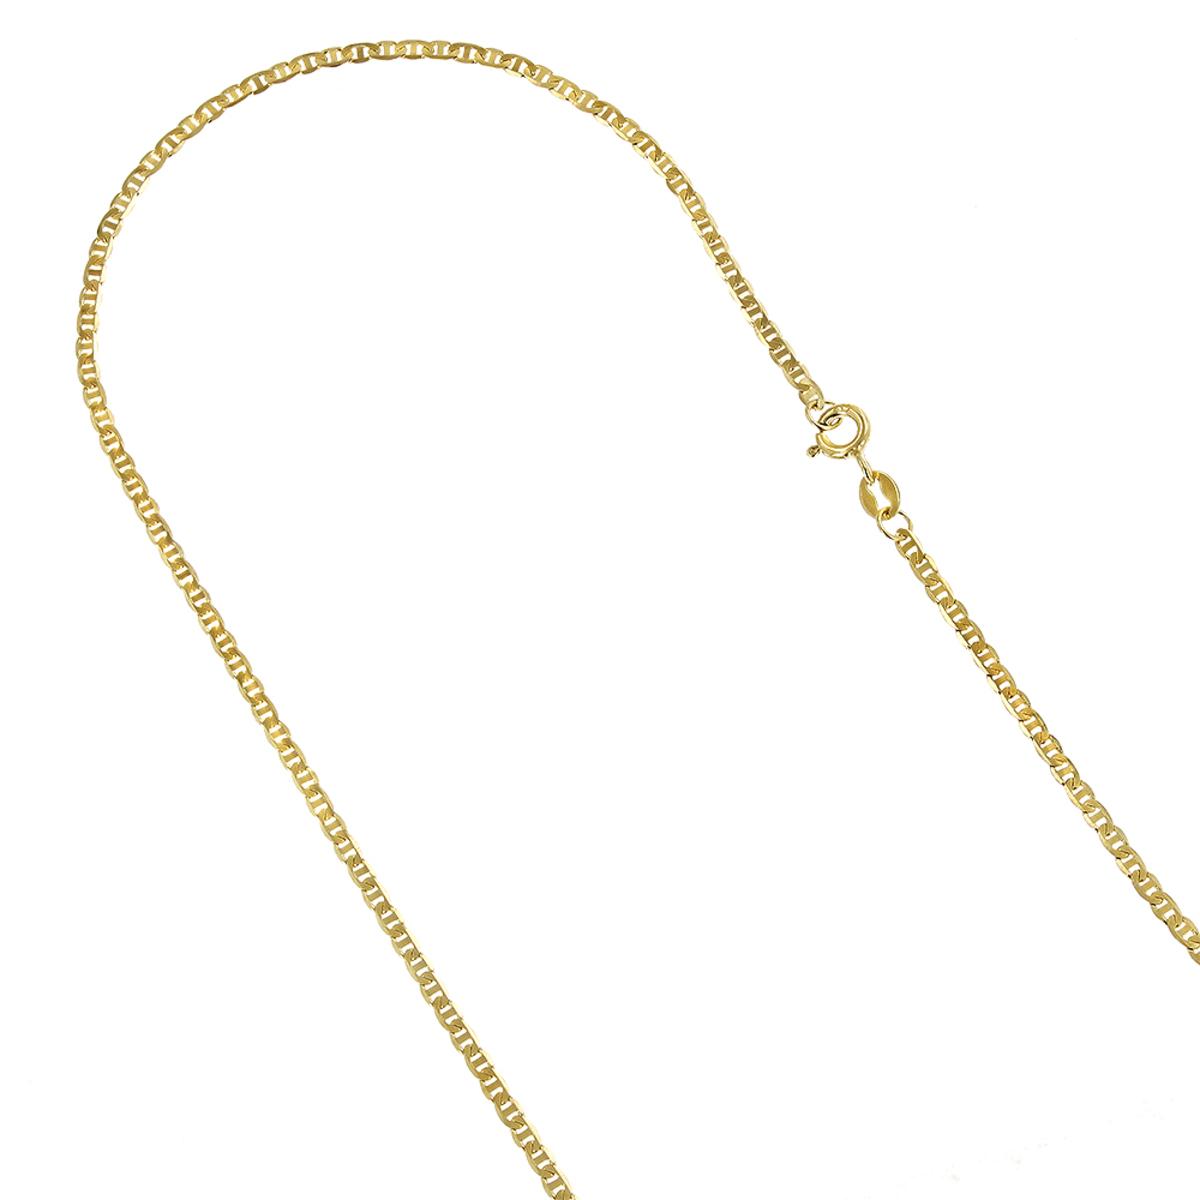 LUXURMAN Solid 10k Gold Mariner Chain For Men & Women 1.2mm Wide